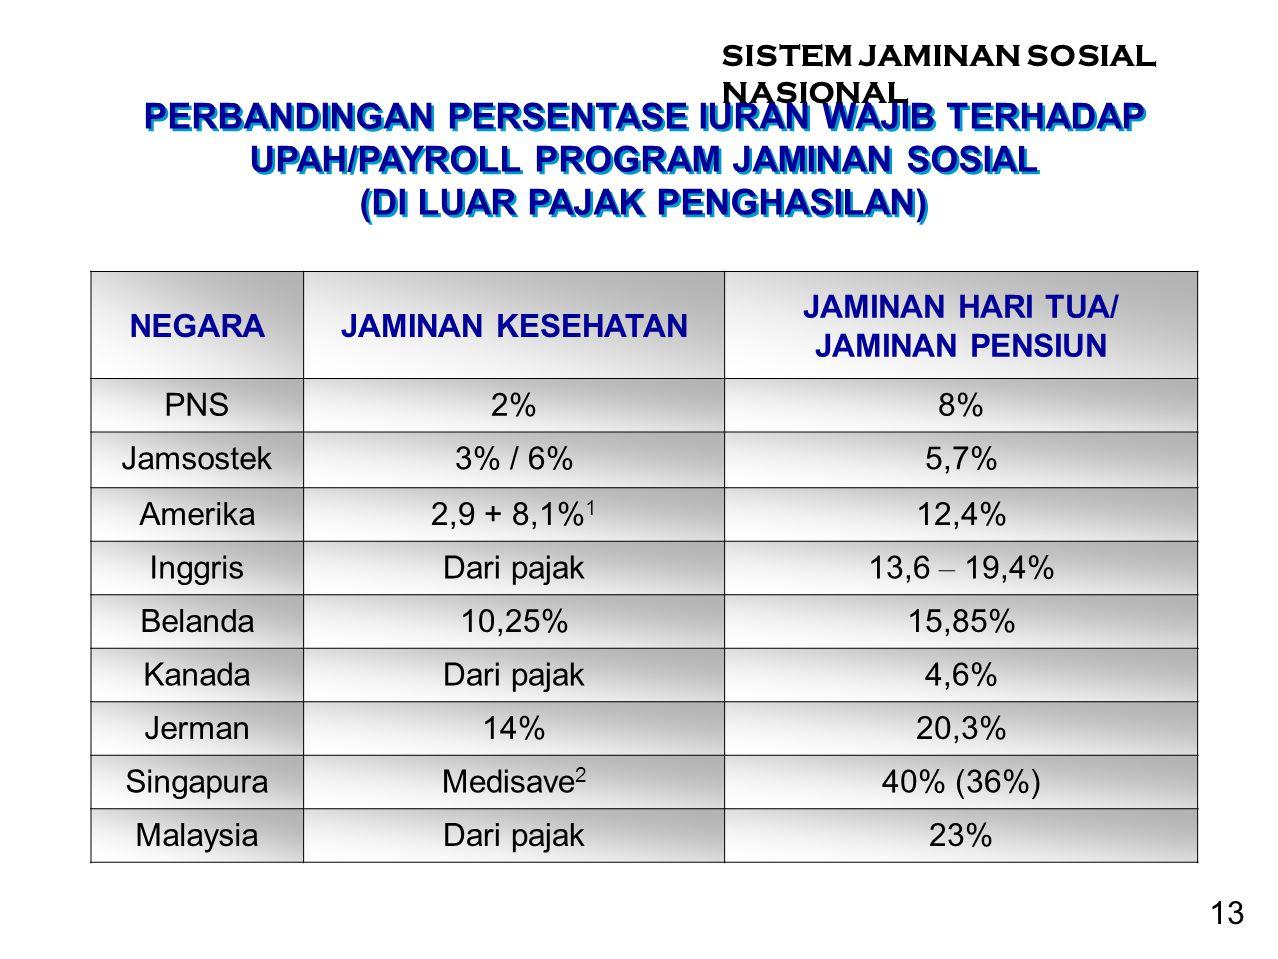 NEGARAJAMINAN KESEHATAN JAMINAN HARI TUA/ JAMINAN PENSIUN PNS2%8% Jamsostek3% / 6%5,7% Amerika2,9 + 8,1% 1 12,4% InggrisDari pajak13,6 – 19,4% Belanda